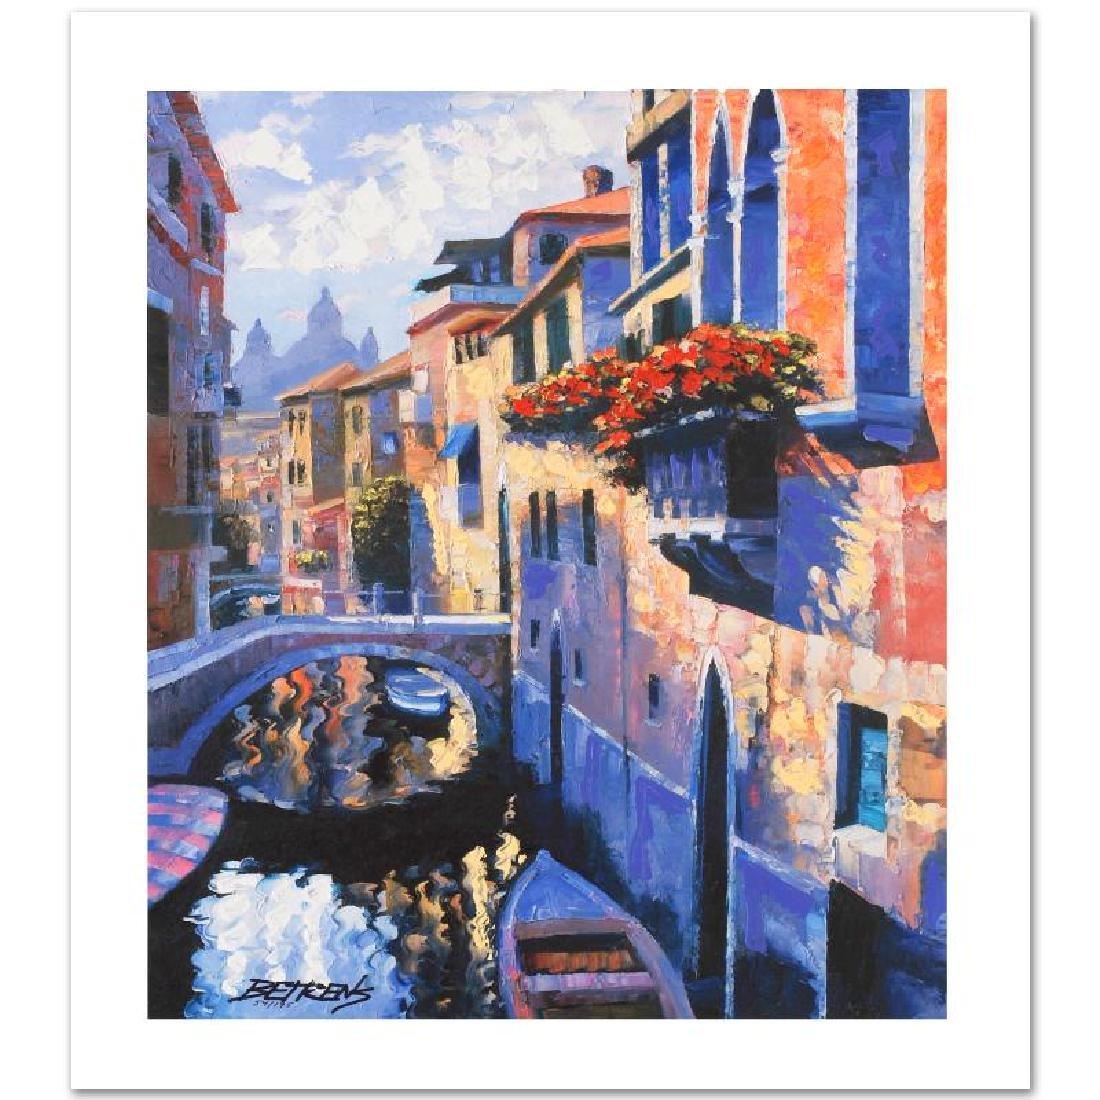 Magic of Venice III by Behrens (1933-2014)